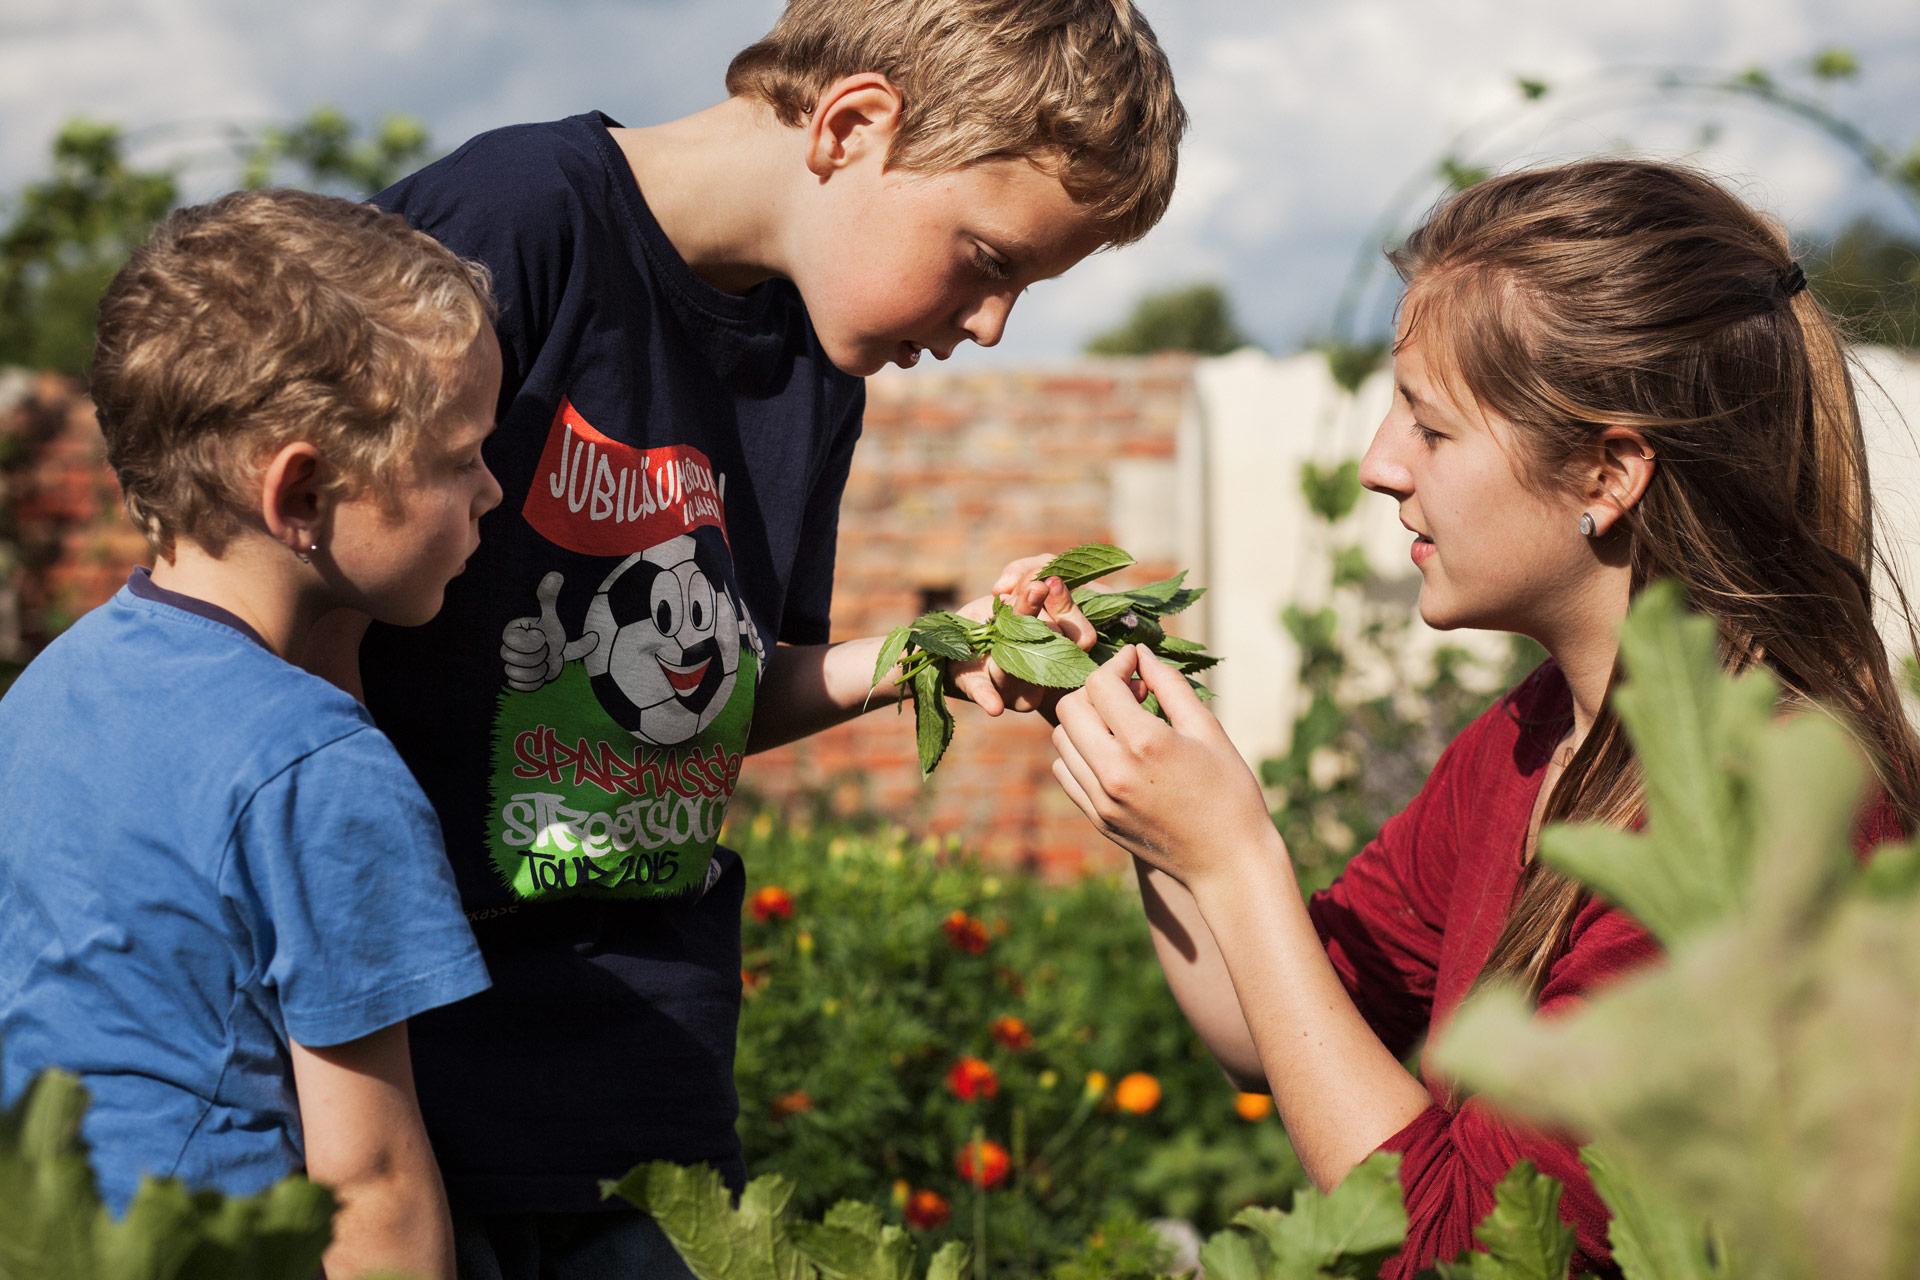 timo-stammberger-photography-fotografie-kinder-kids-education-kochen-vegan-plant-based-healthy-food